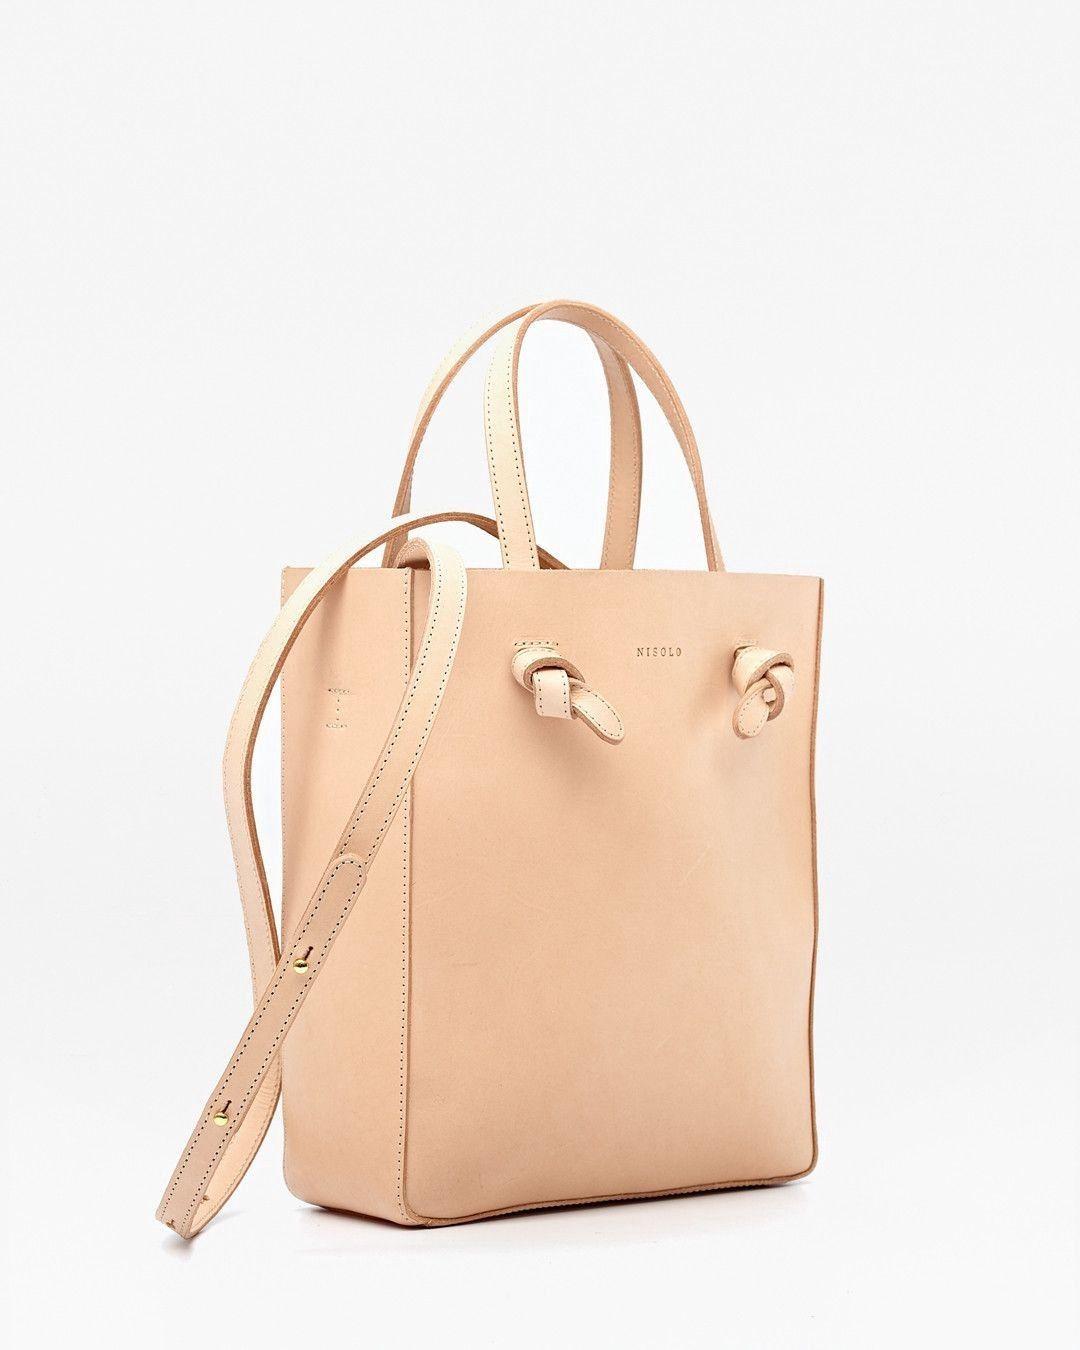 44ab0686676 Nisolo Simone Crossbody Shopper Natural Vachetta Crossbody Tote, Leather  Crossbody, Satchel, Ethical Clothing